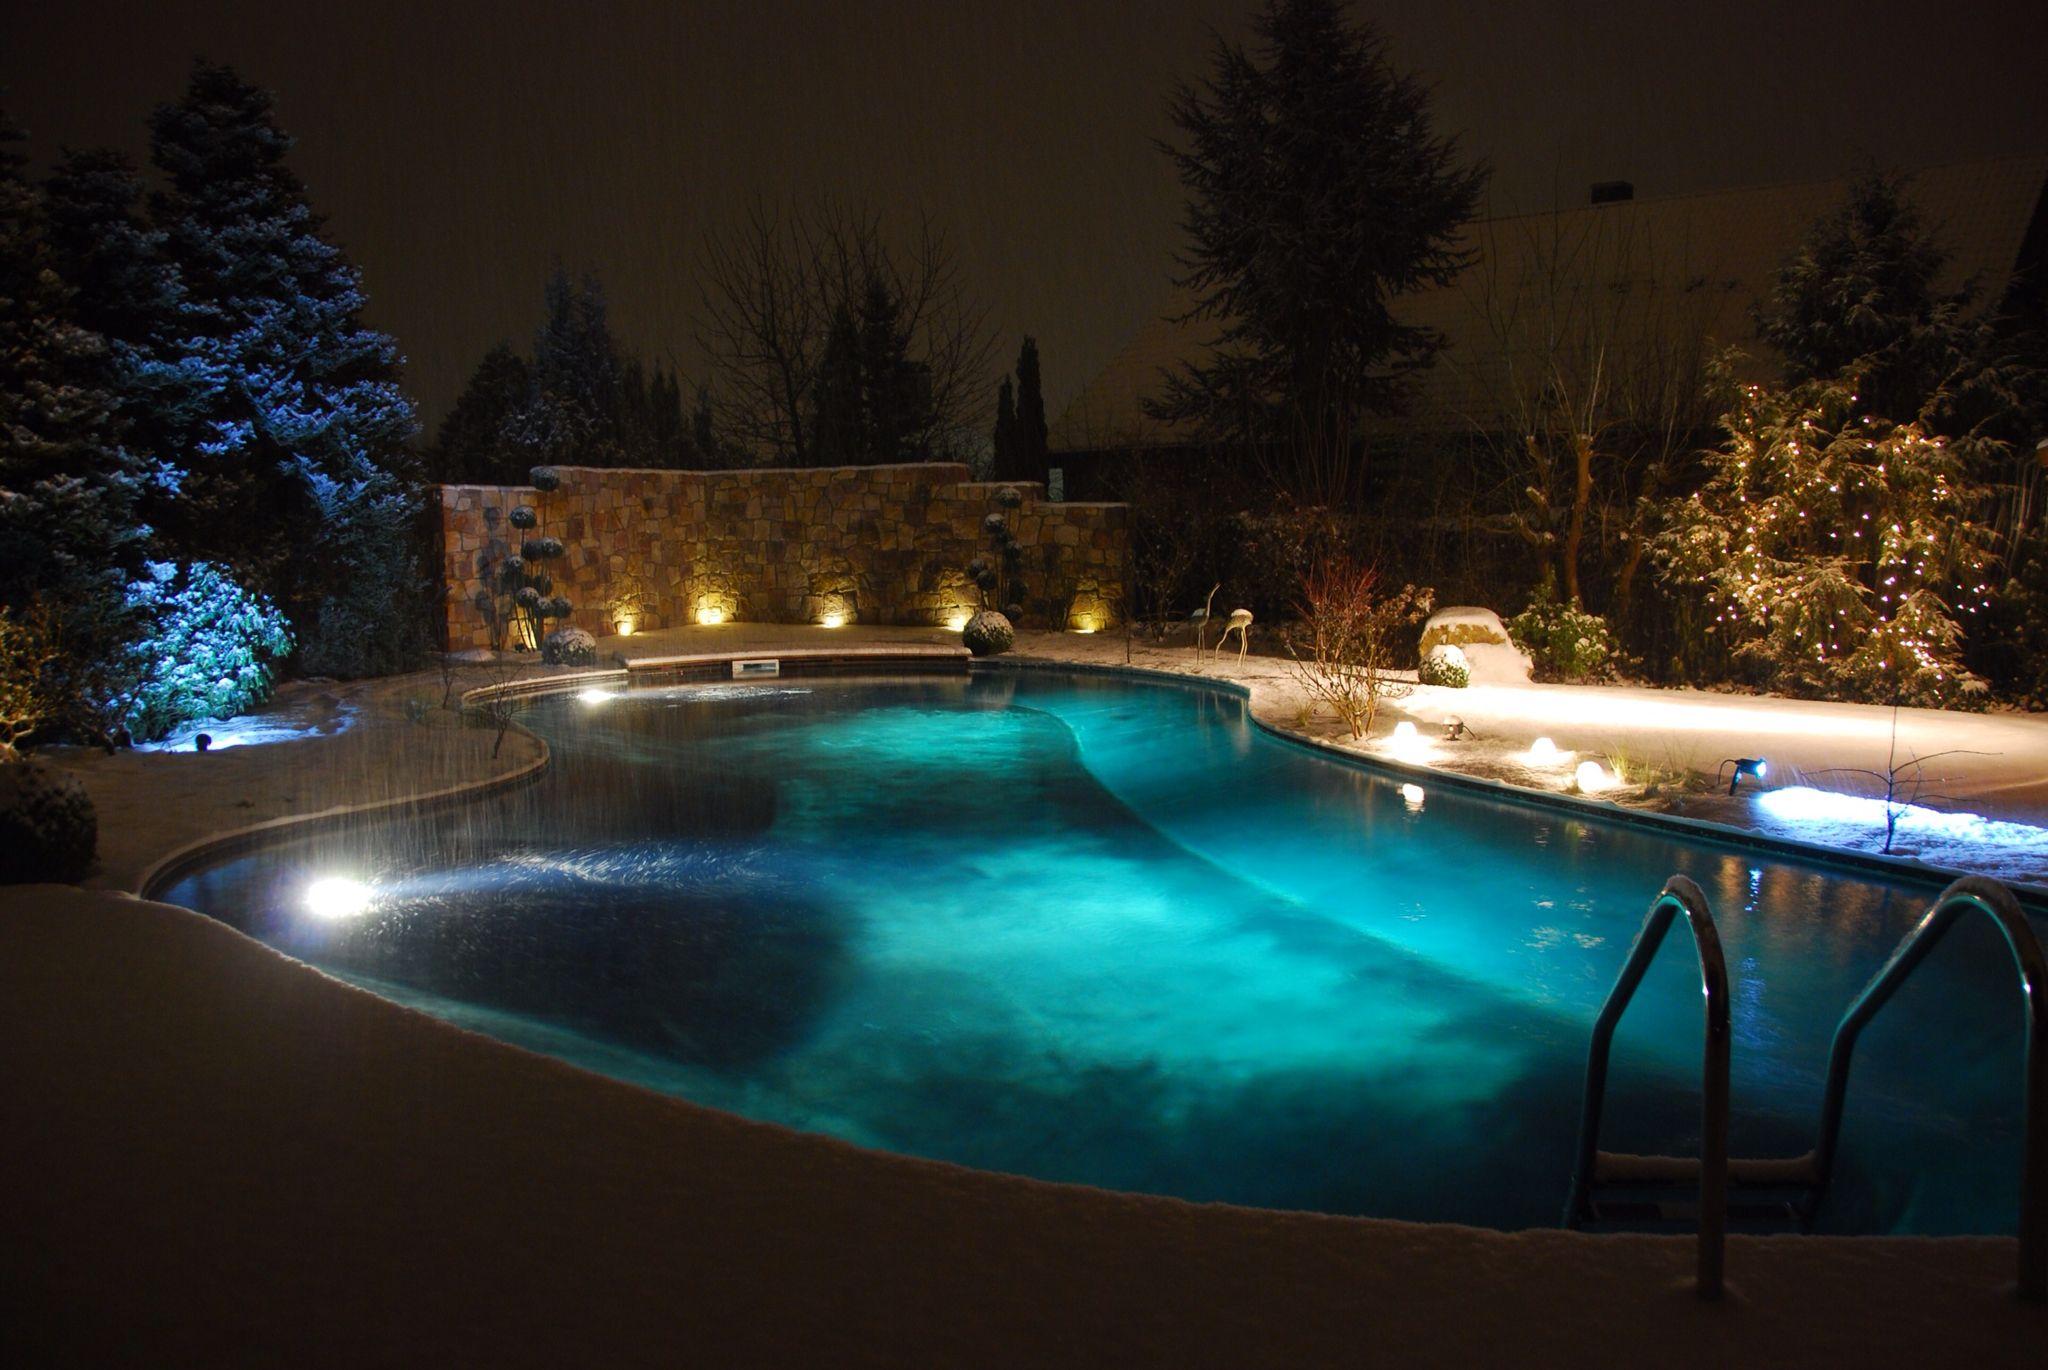 schwimmteich freie form mit salzelektrolyse salzwasser pool salt water chlorinator. Black Bedroom Furniture Sets. Home Design Ideas